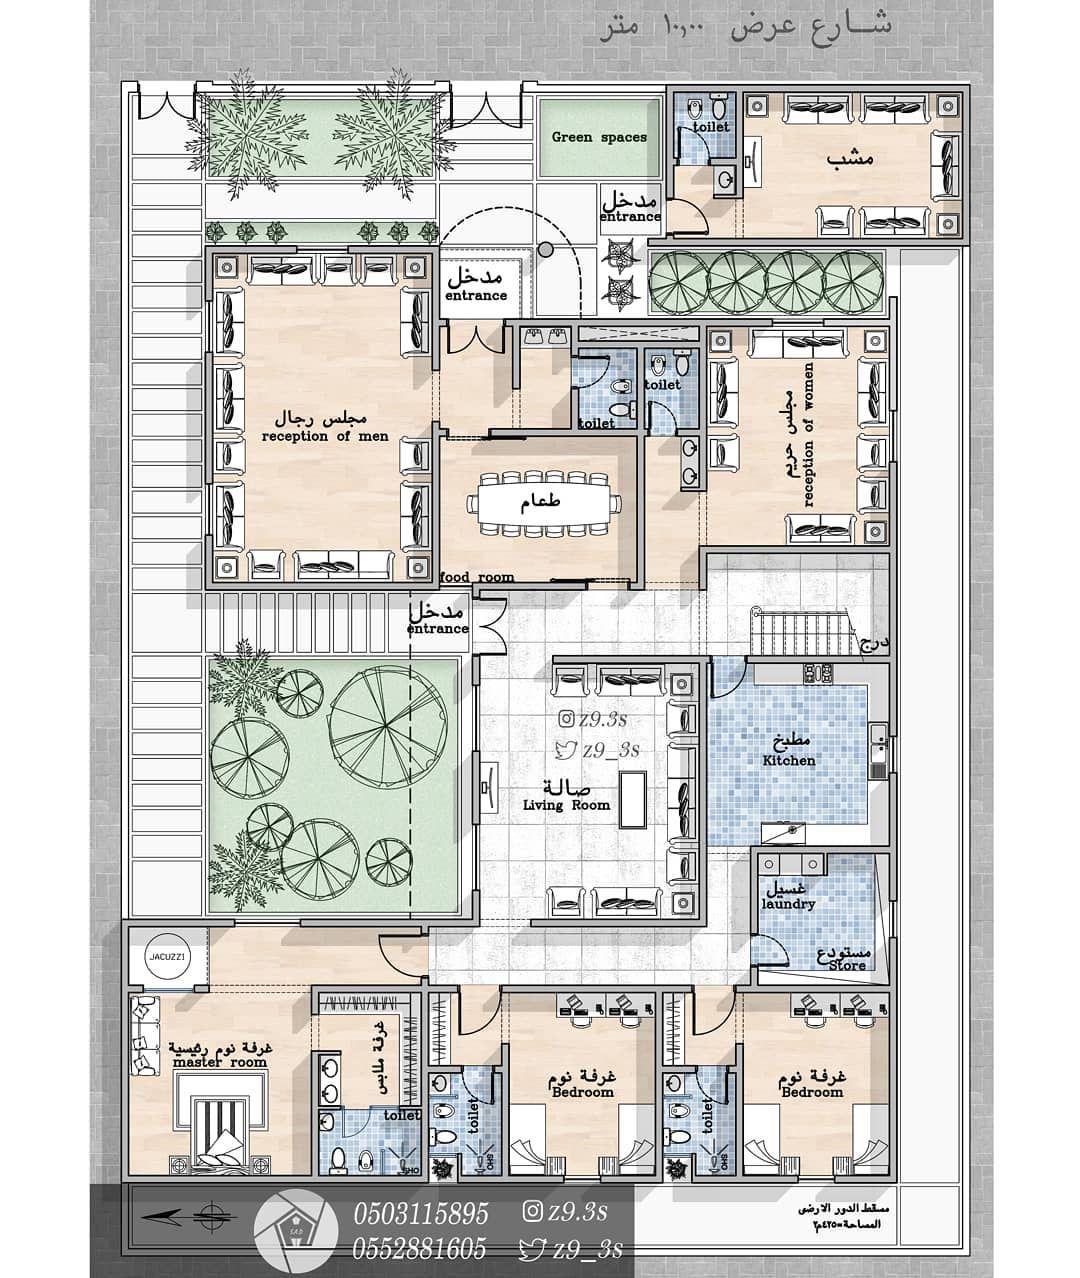 South Studio On Instagram تصميم فيلا دور أرضي فقط بمساحة ٤٢٥م٢ عسير المدينة المنورة مخططات الرياض مخ House Layout Plans My House Plans Model House Plan